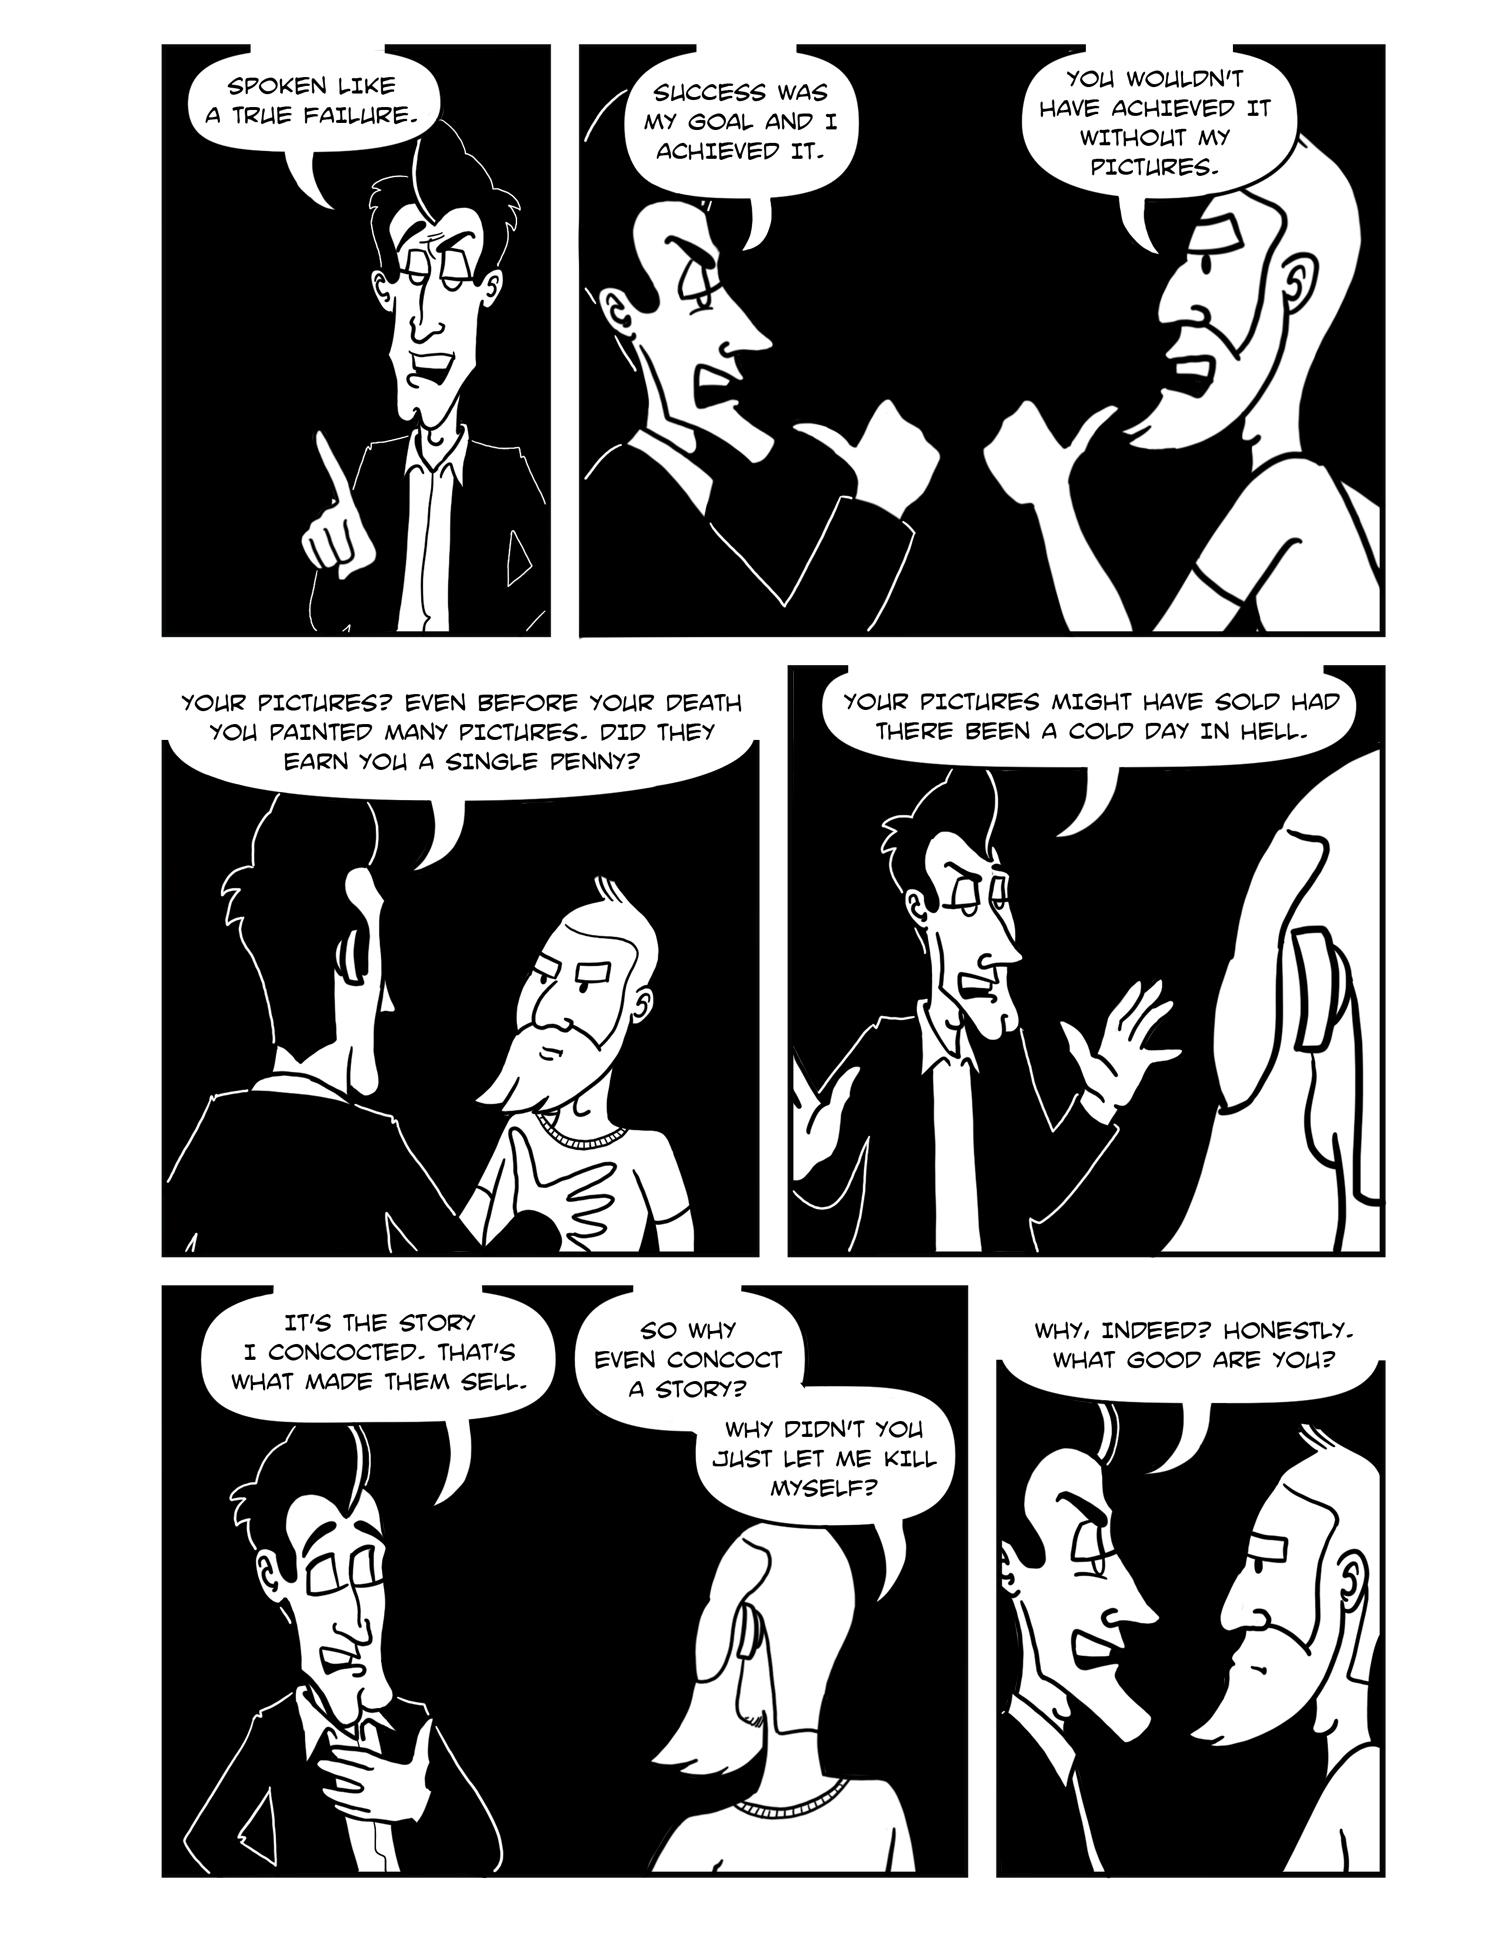 PAGE-211.jpg